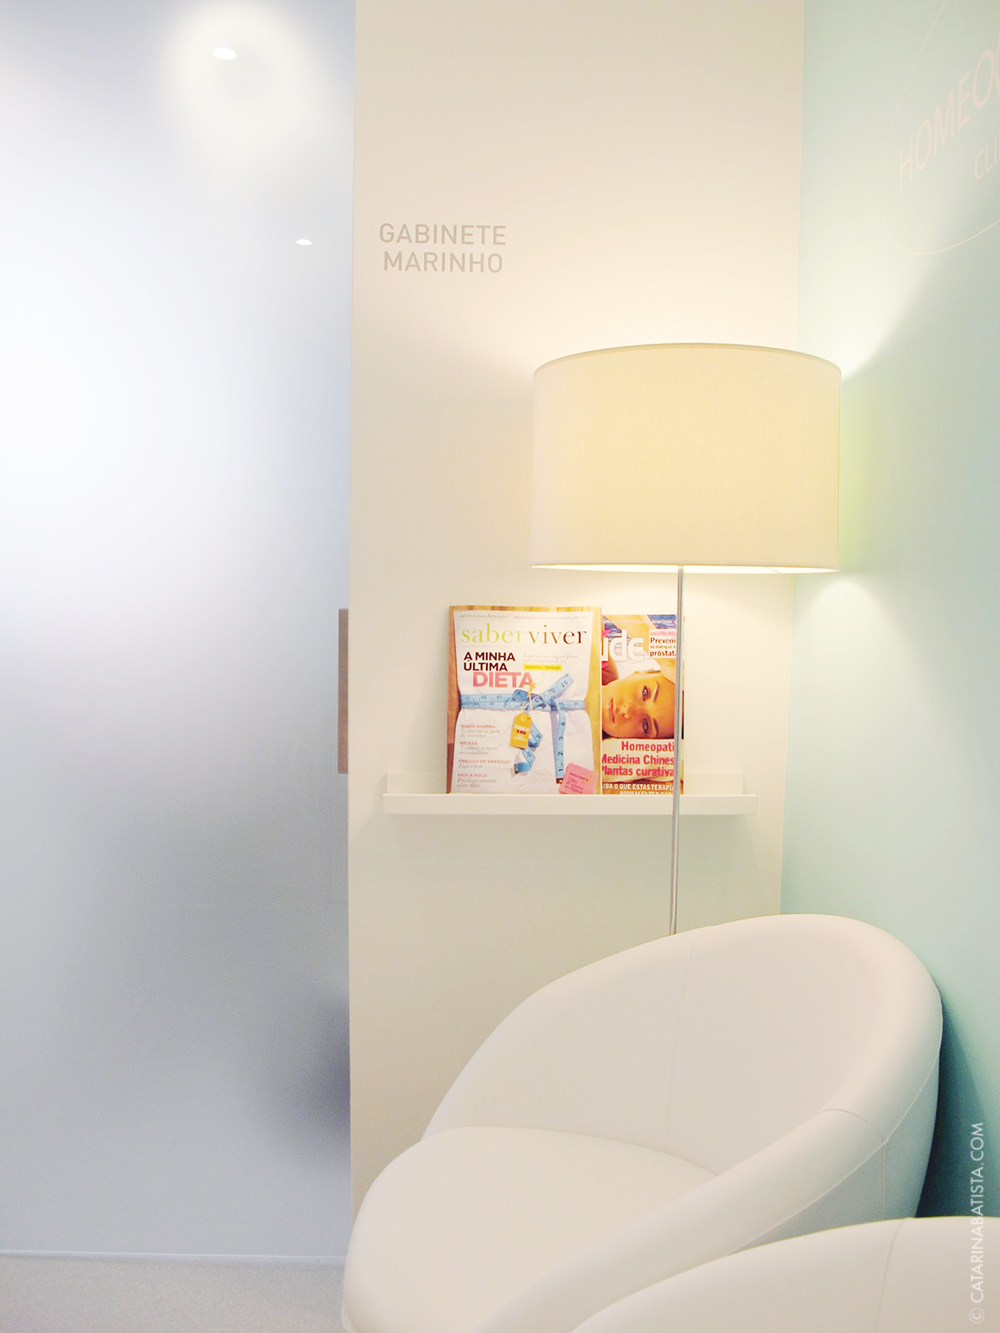 015-catarina-batista-arquitectura-design-interior-decoracao-clinicia.jpeg